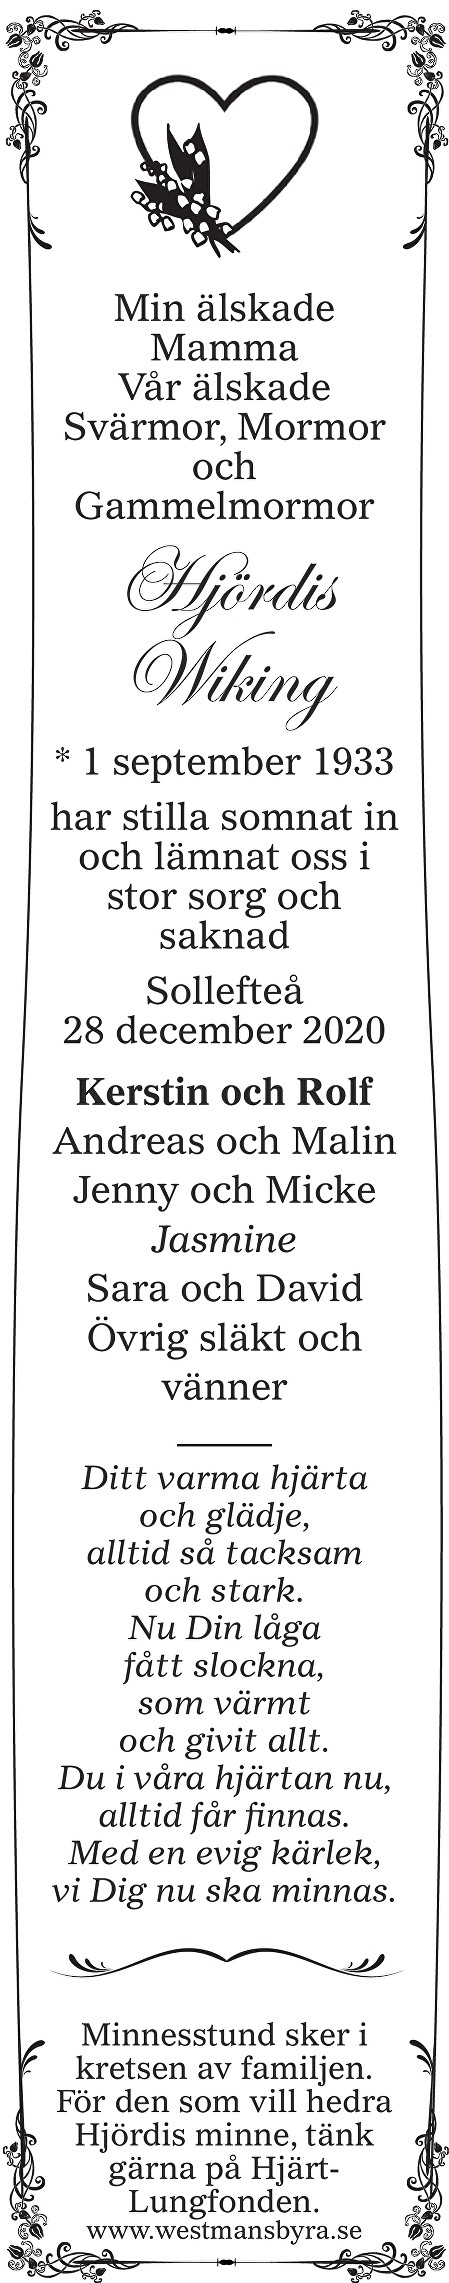 Hjördis Wiking Death notice